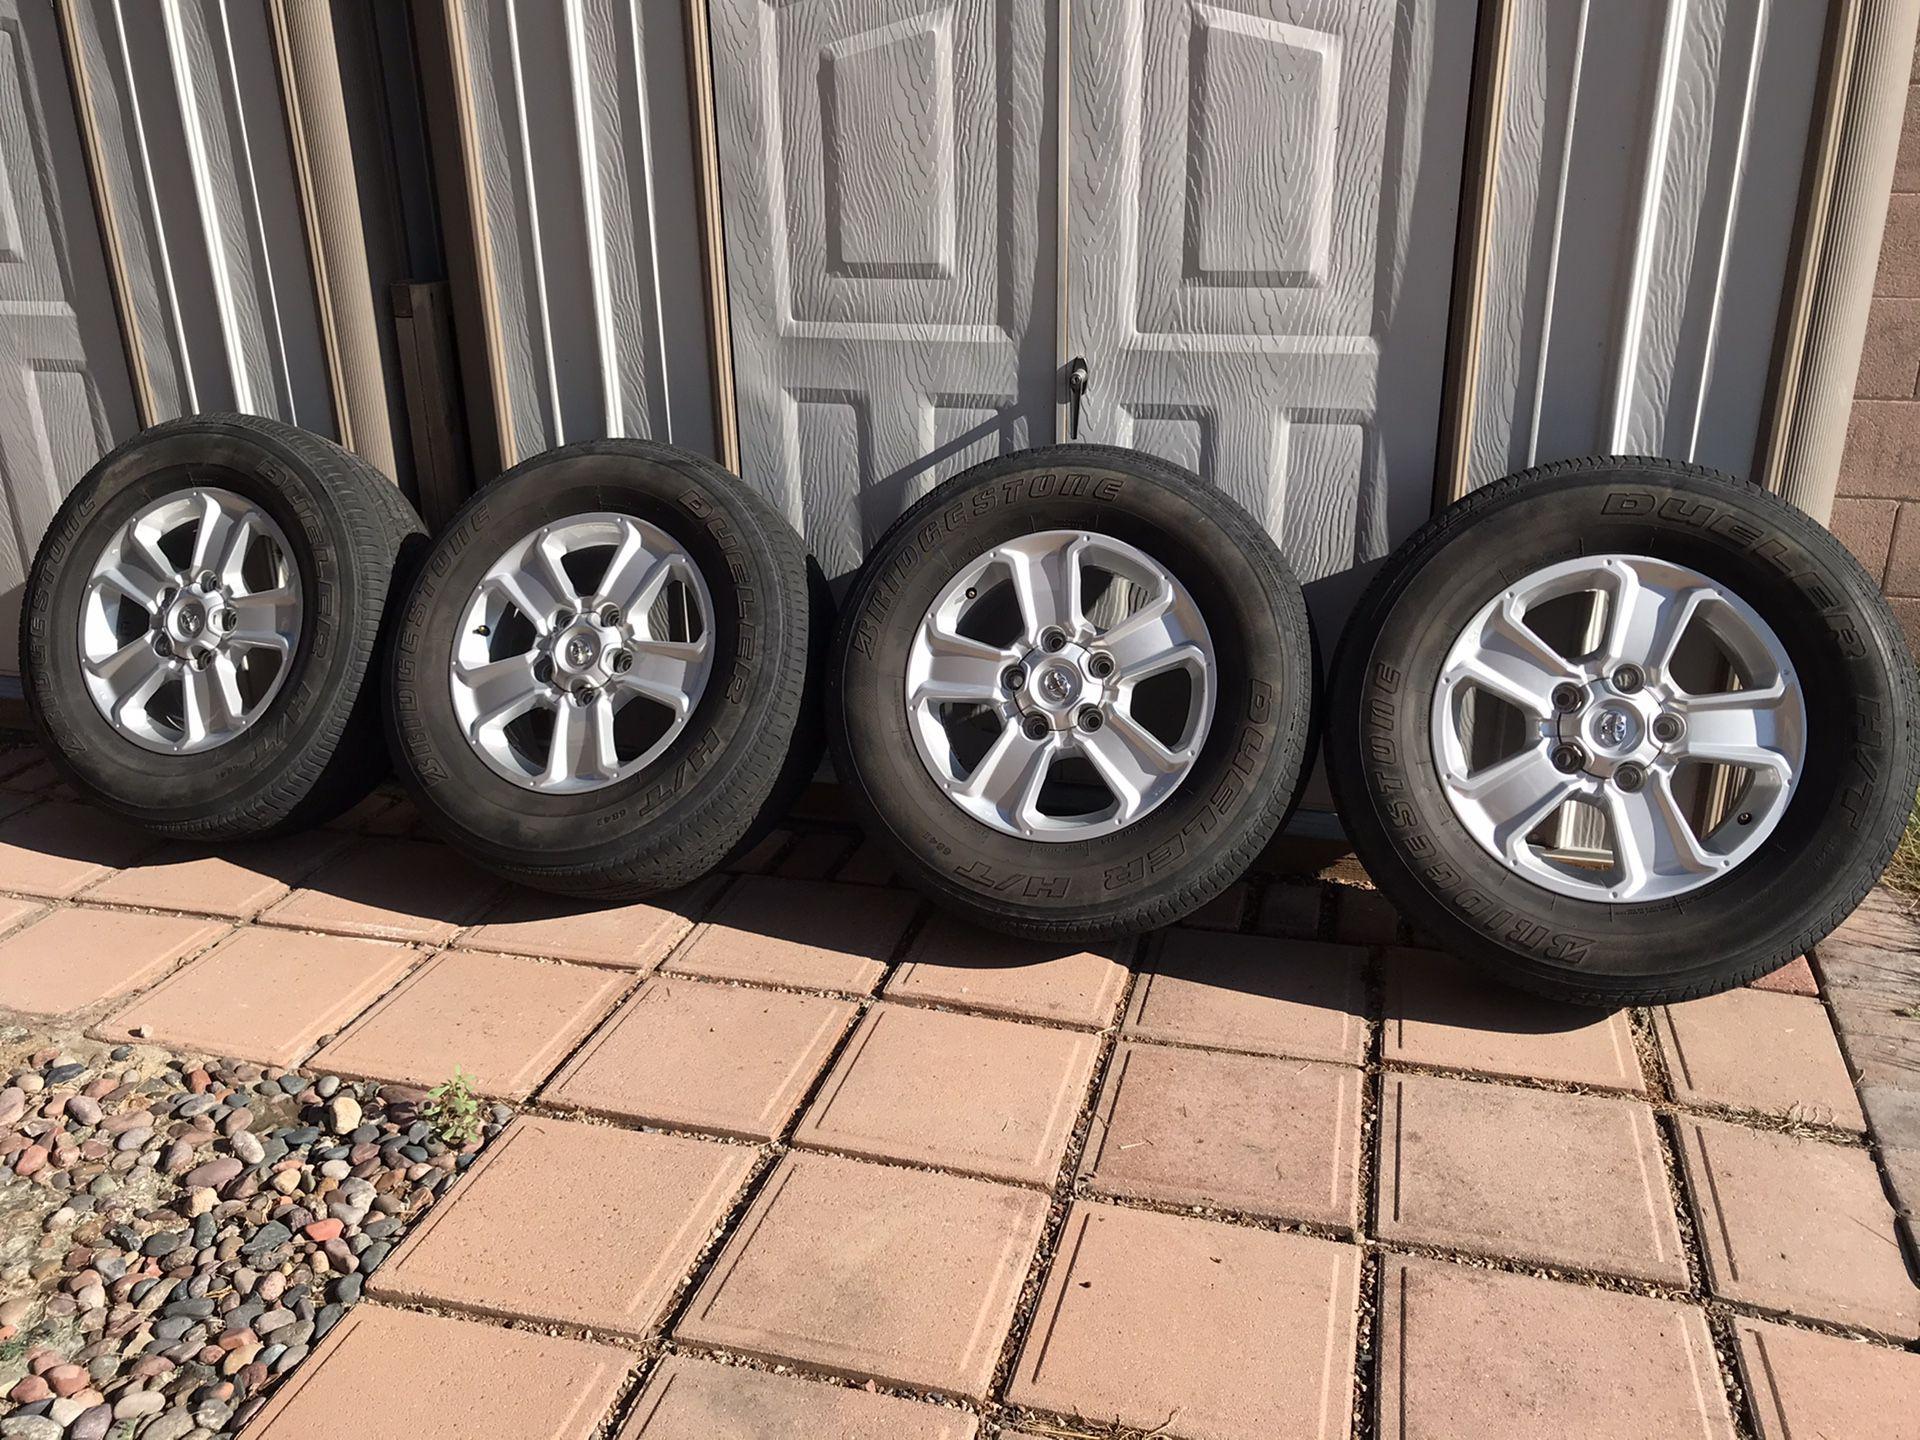 Toyota Tundra Wheels 275/65R18